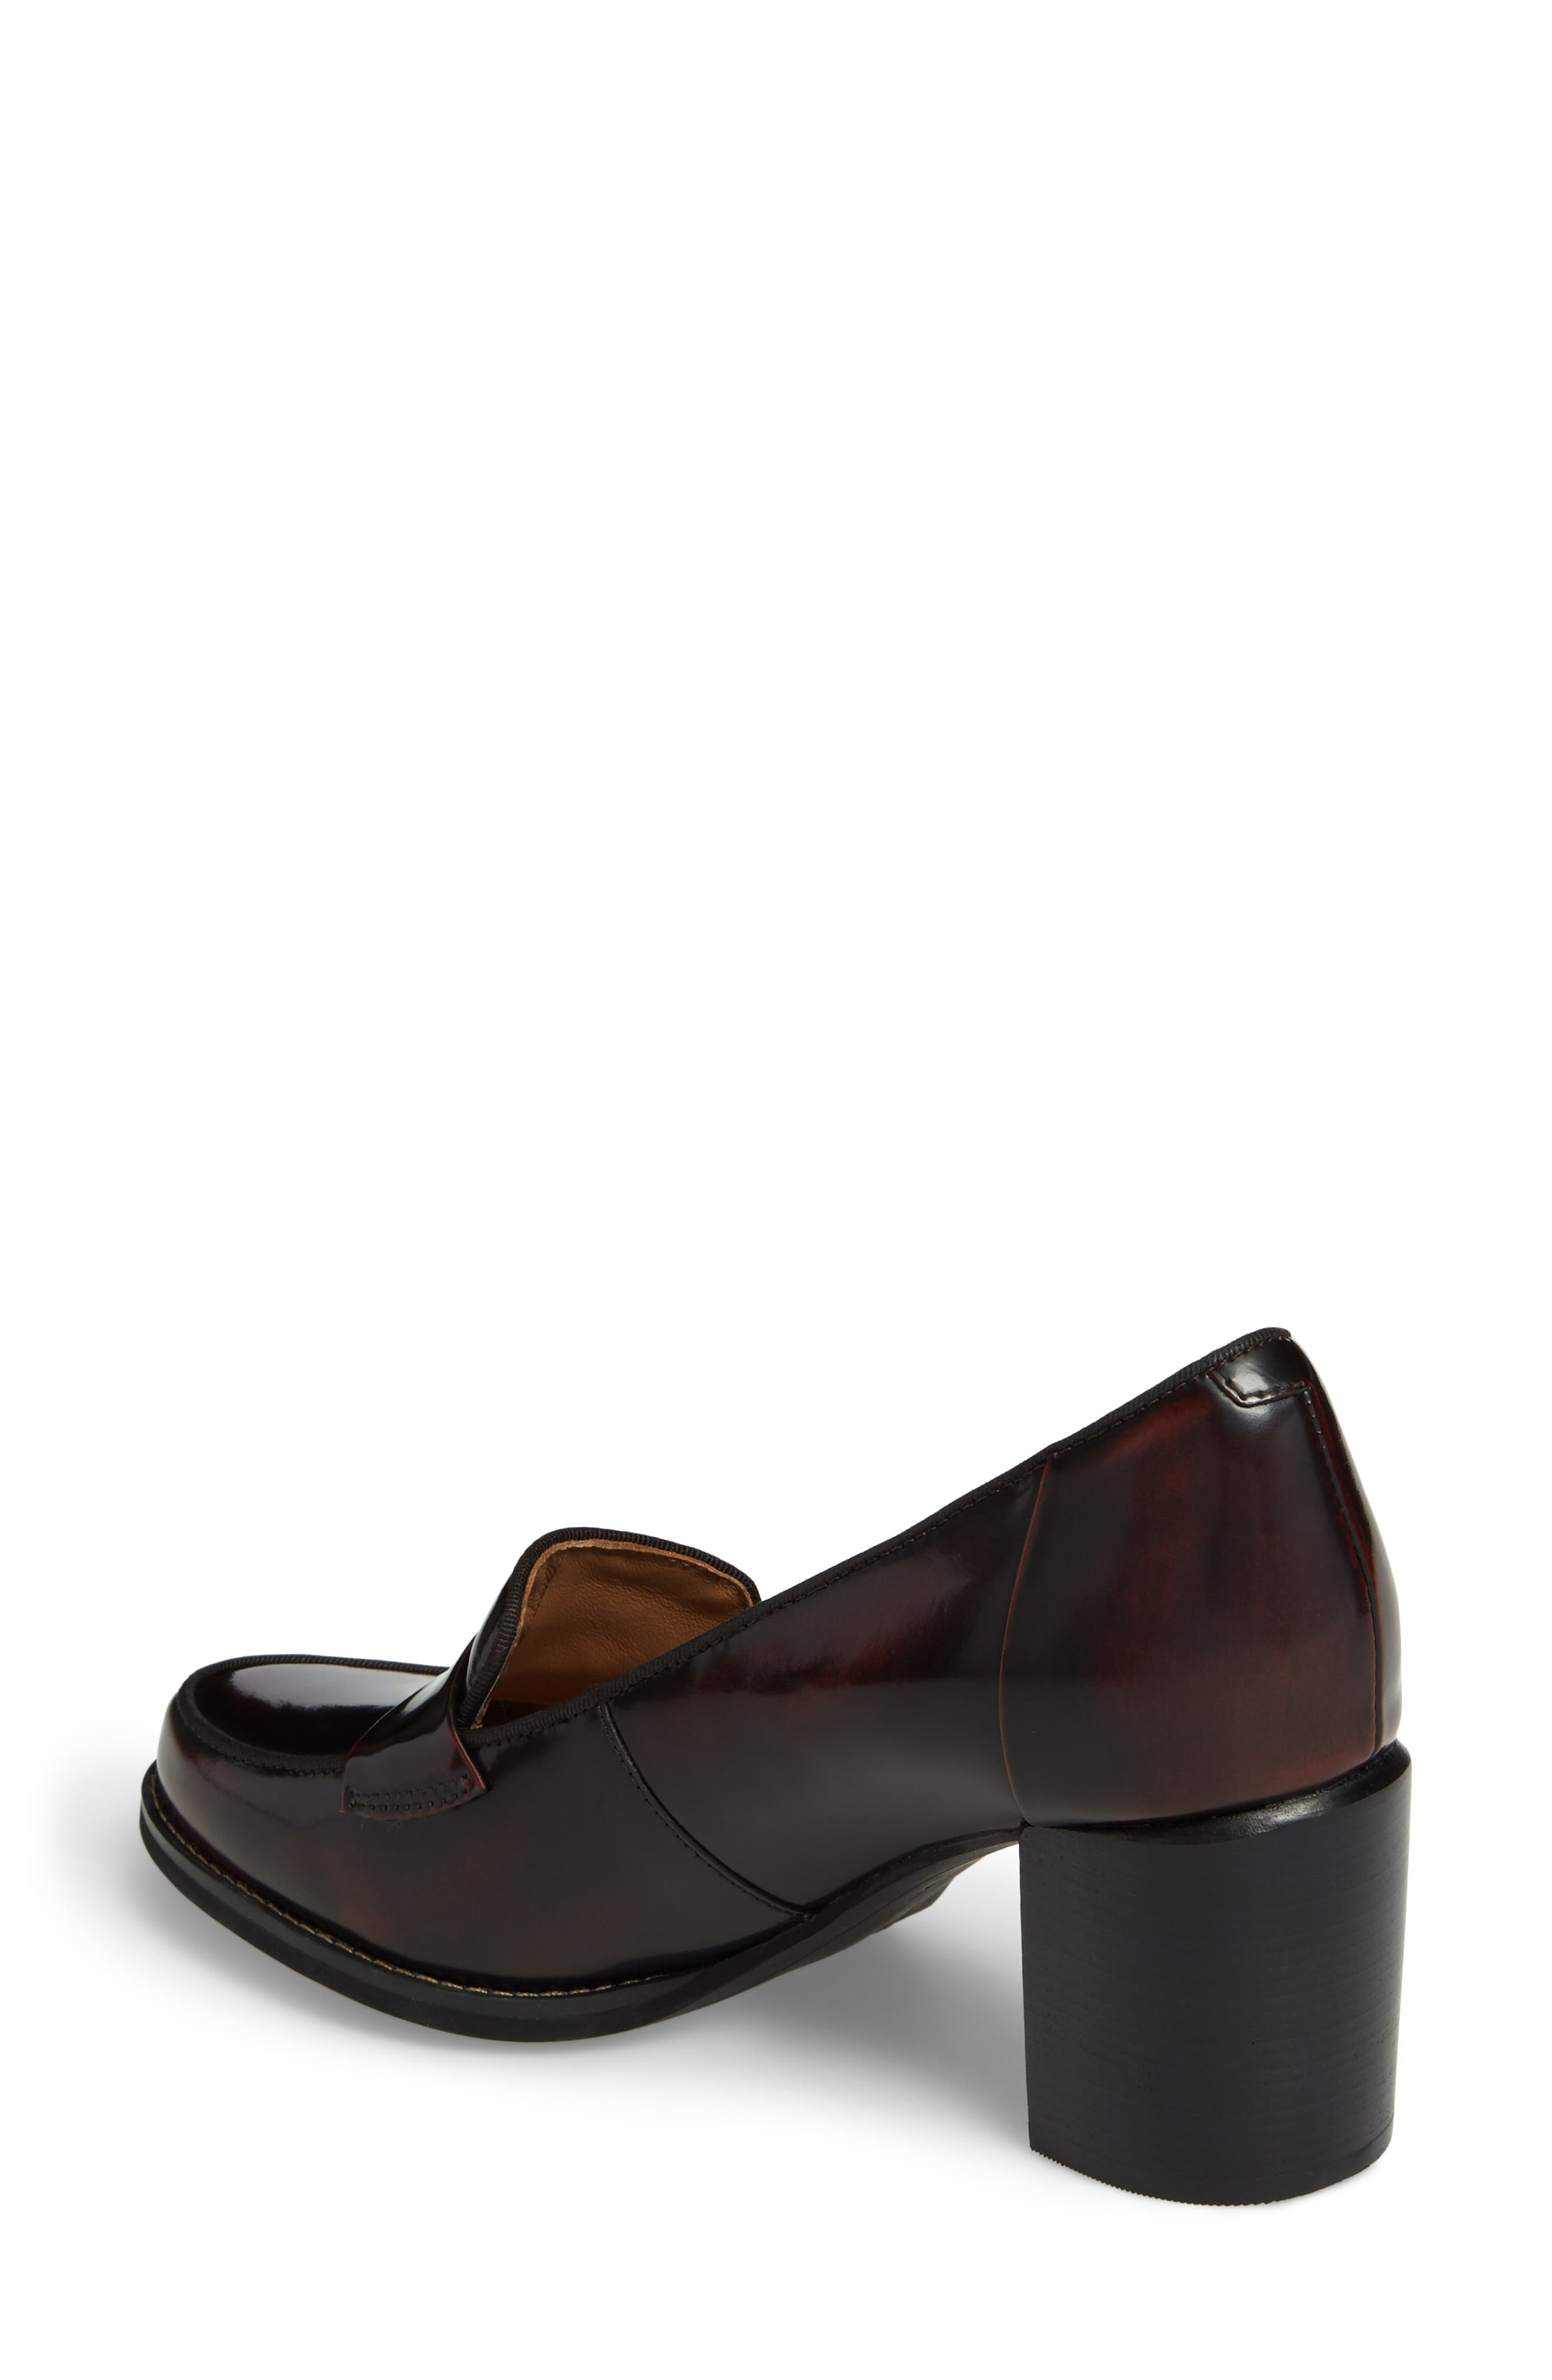 Tarah Grace Pump,                             Alternate thumbnail 2, color,                             Burgundy Leather